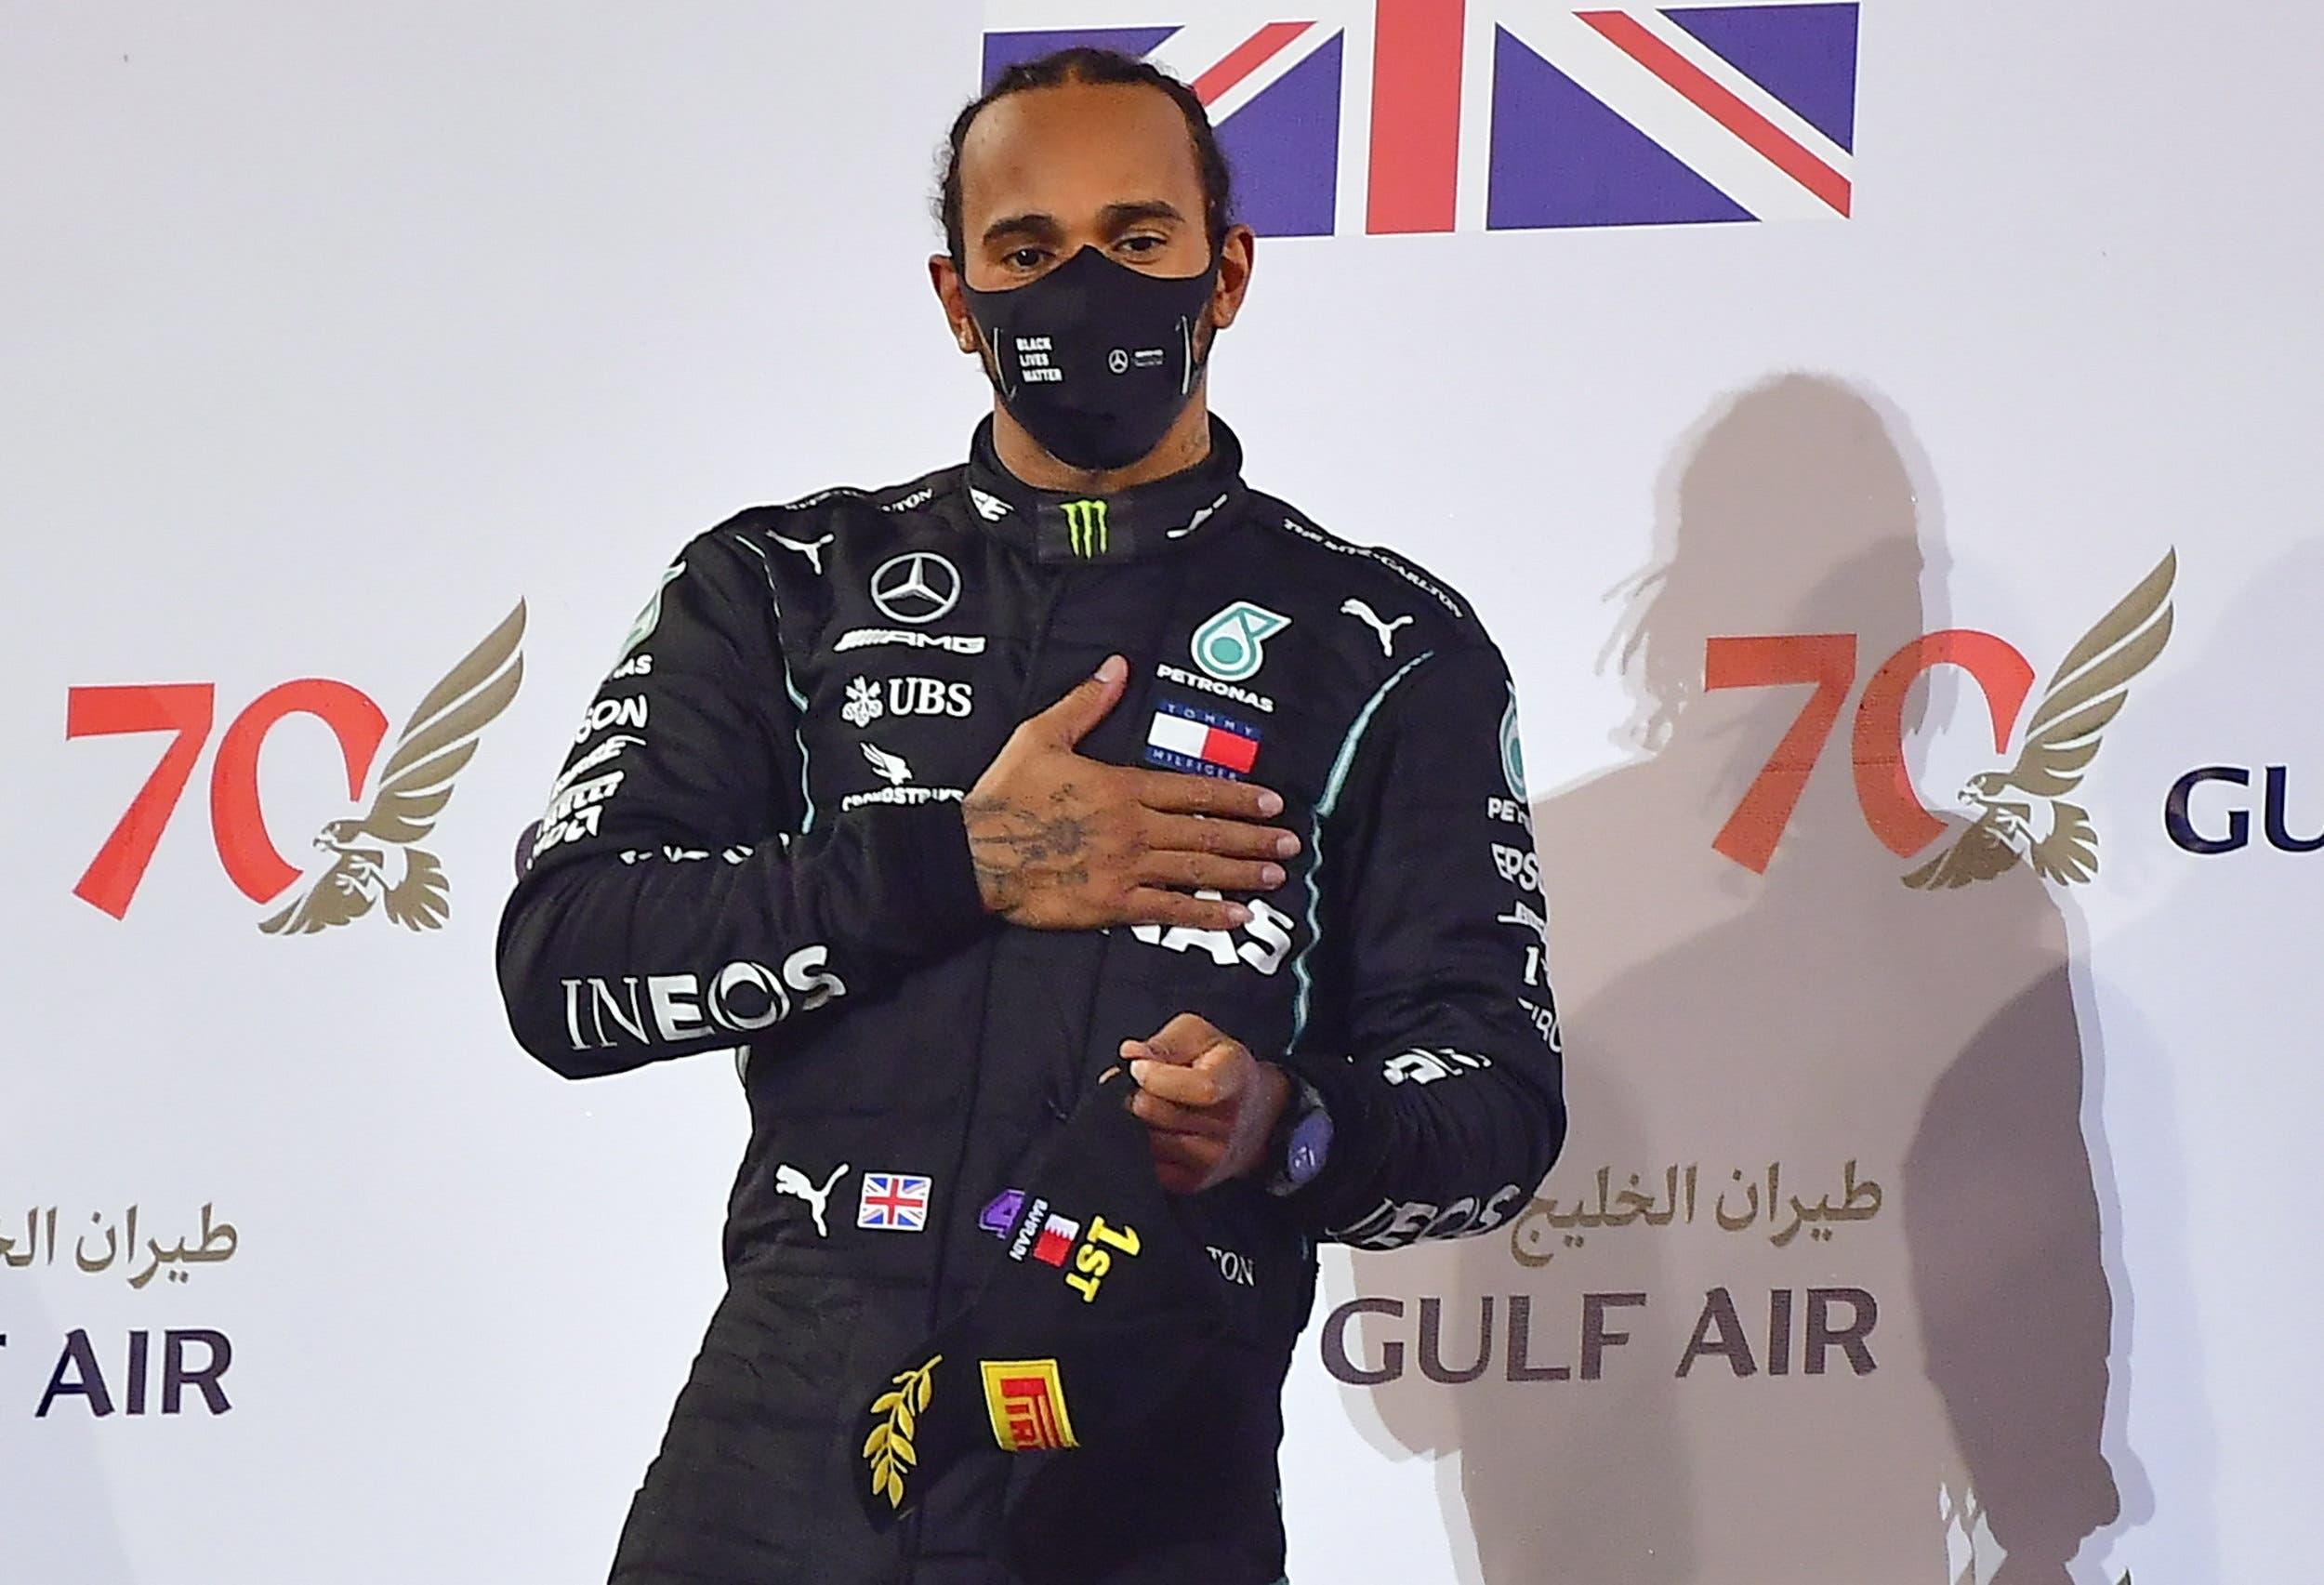 Hamilton da positivo al COVID-19, no estará en GP de Sakhir